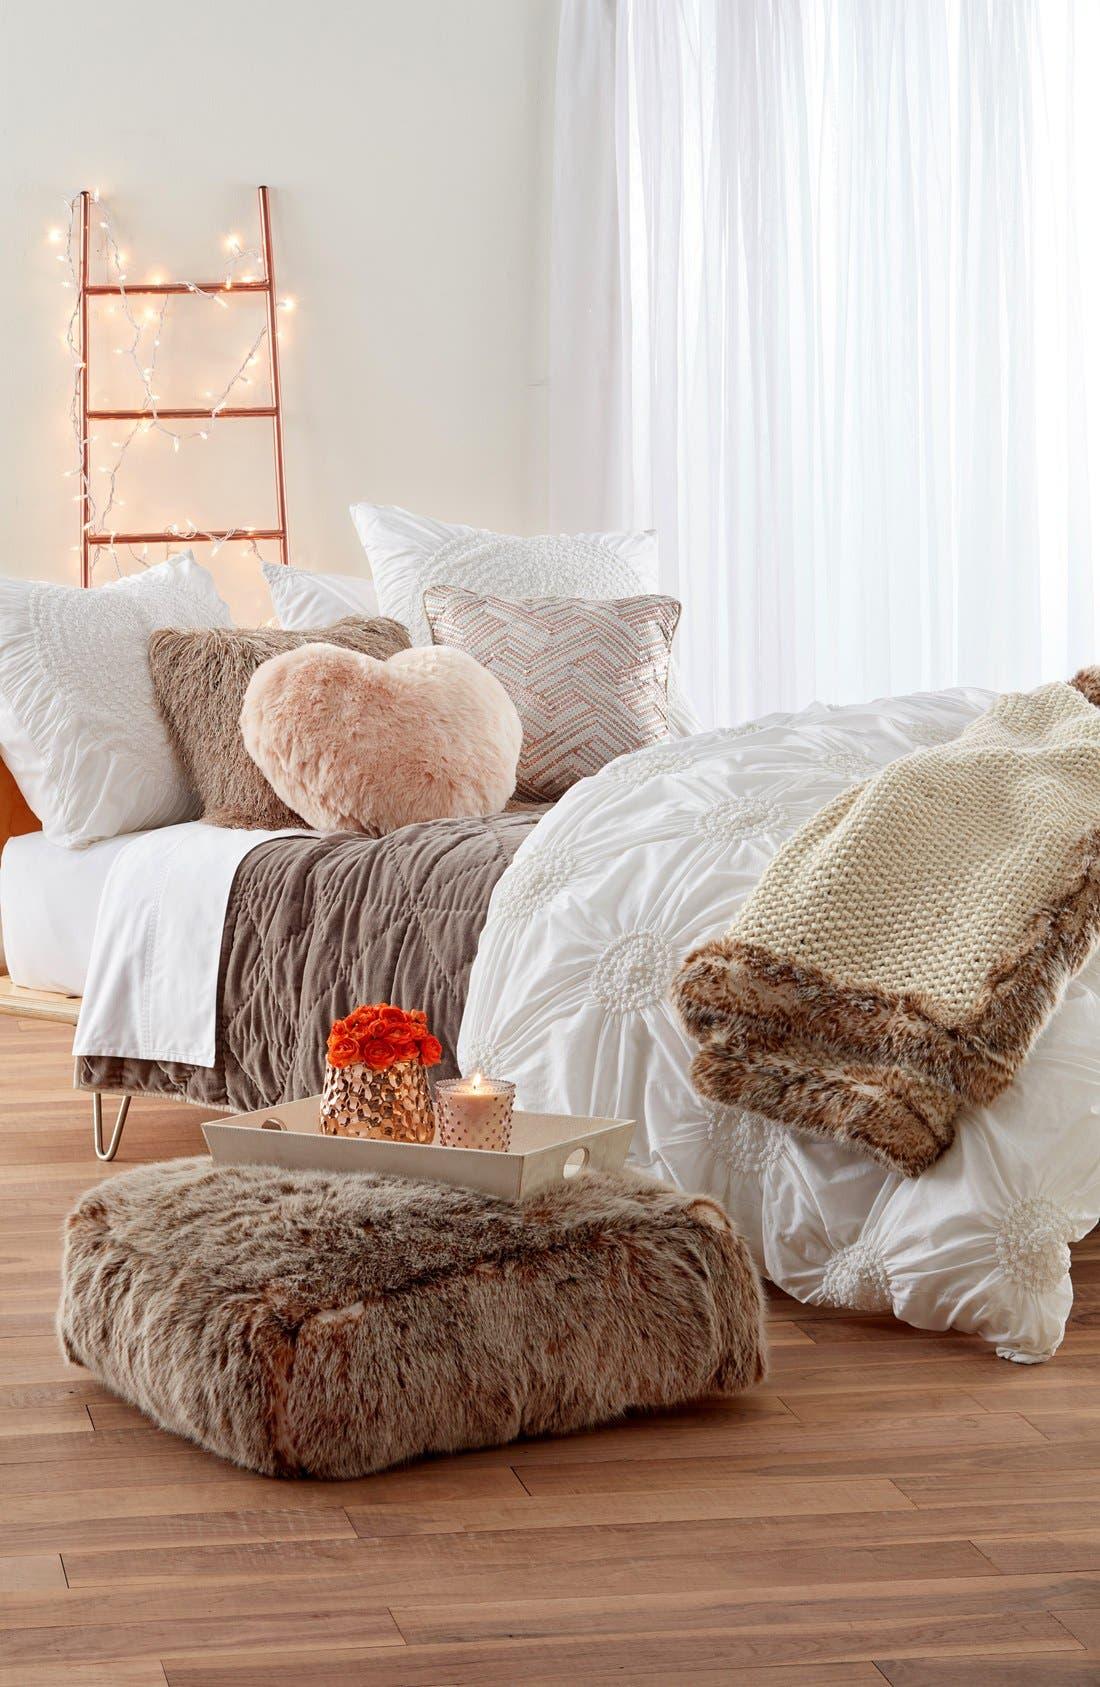 VILLA HOME COLLECTION,                             'Lona' Sequin Accent Pillow,                             Alternate thumbnail 4, color,                             650